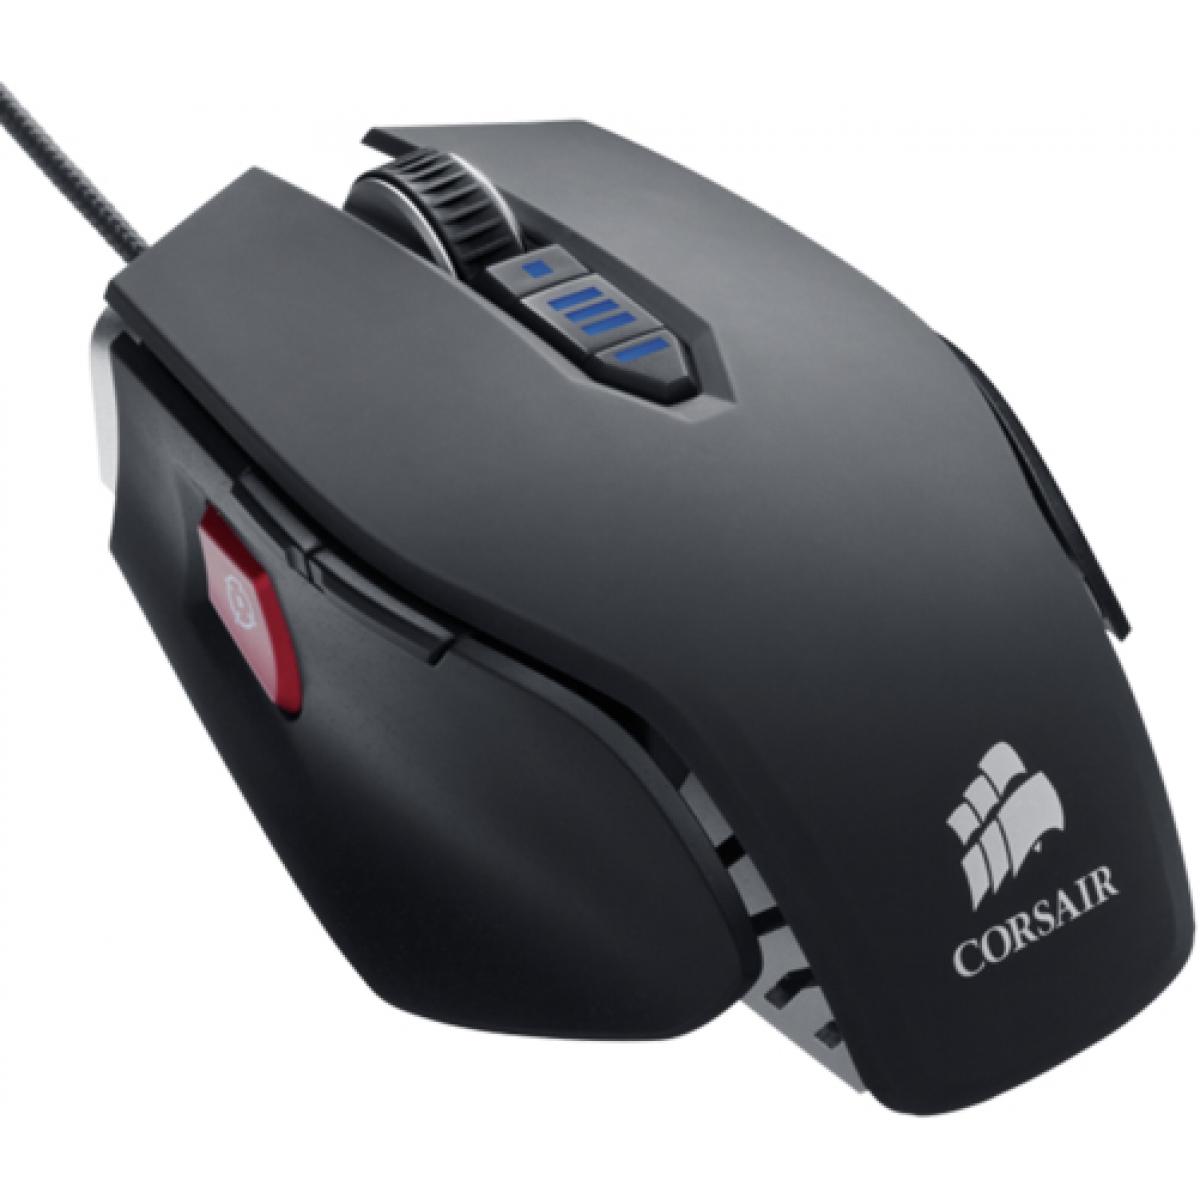 Mouse Corsair Gamer Vengeance M60 CH-9000001-NA 8 Botões 5700 DPI Preto